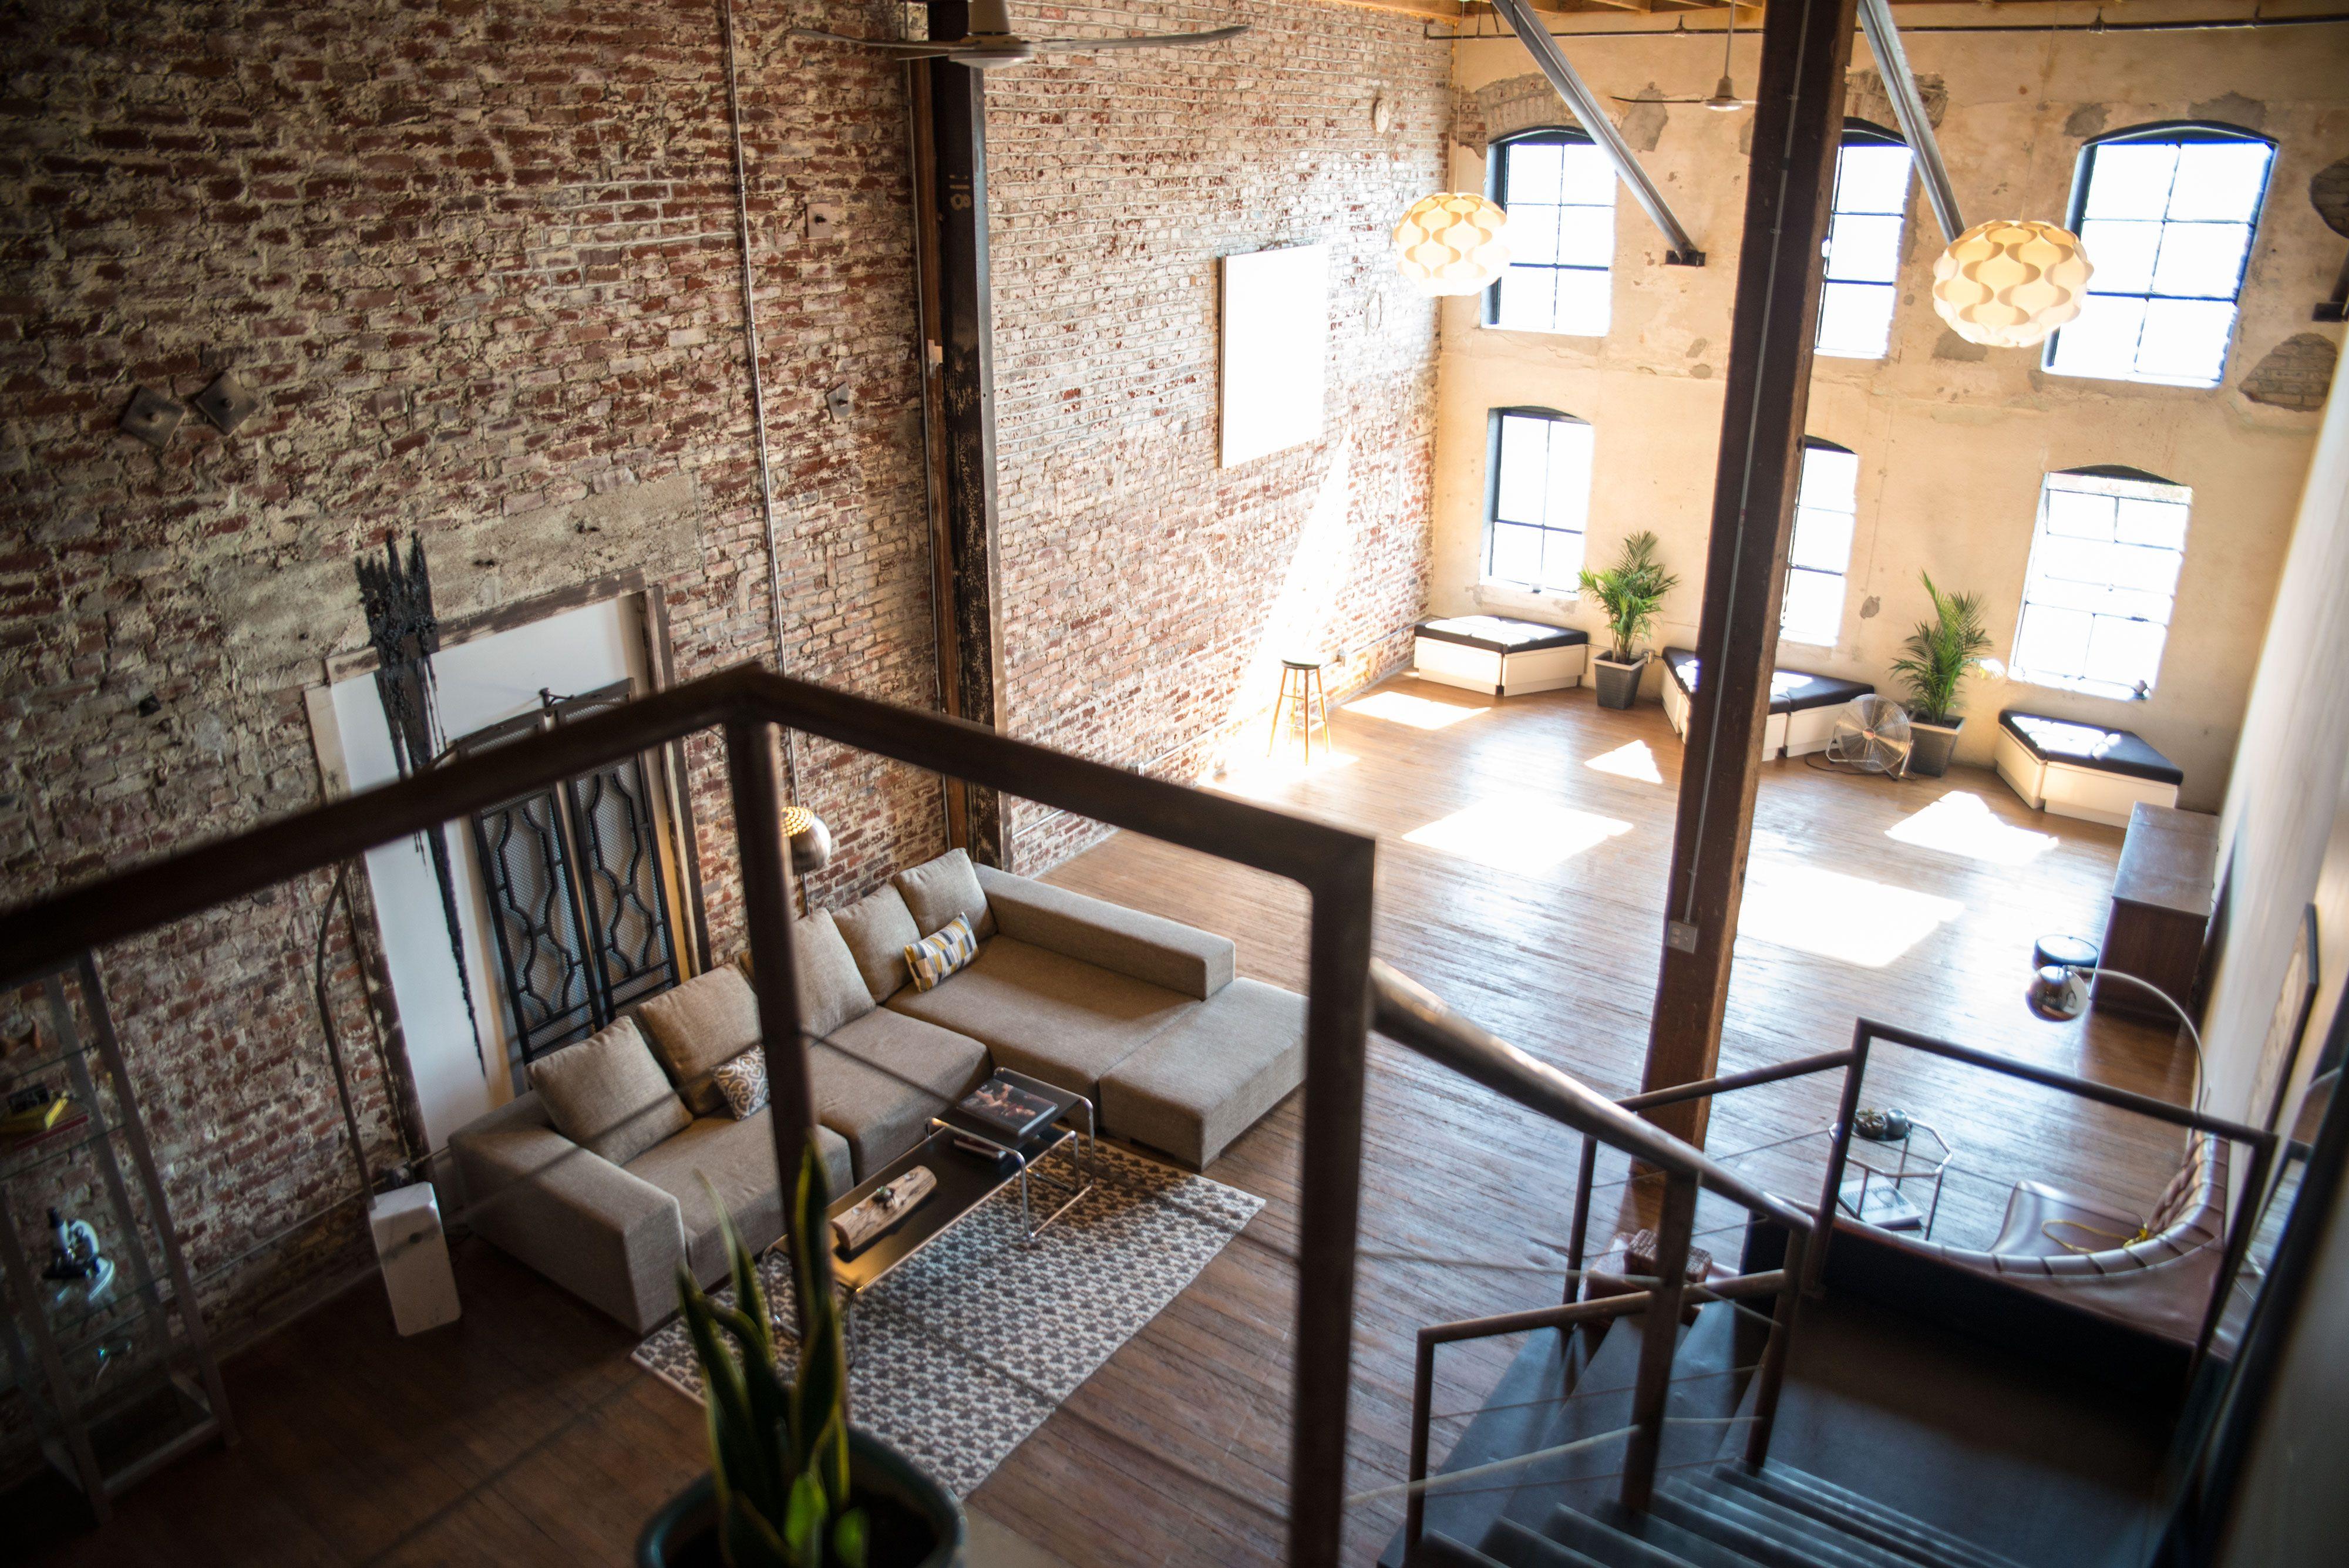 natural lighting futura lofts. 10 Best Production Venues - Los Angeles, CA Natural Lighting Futura Lofts